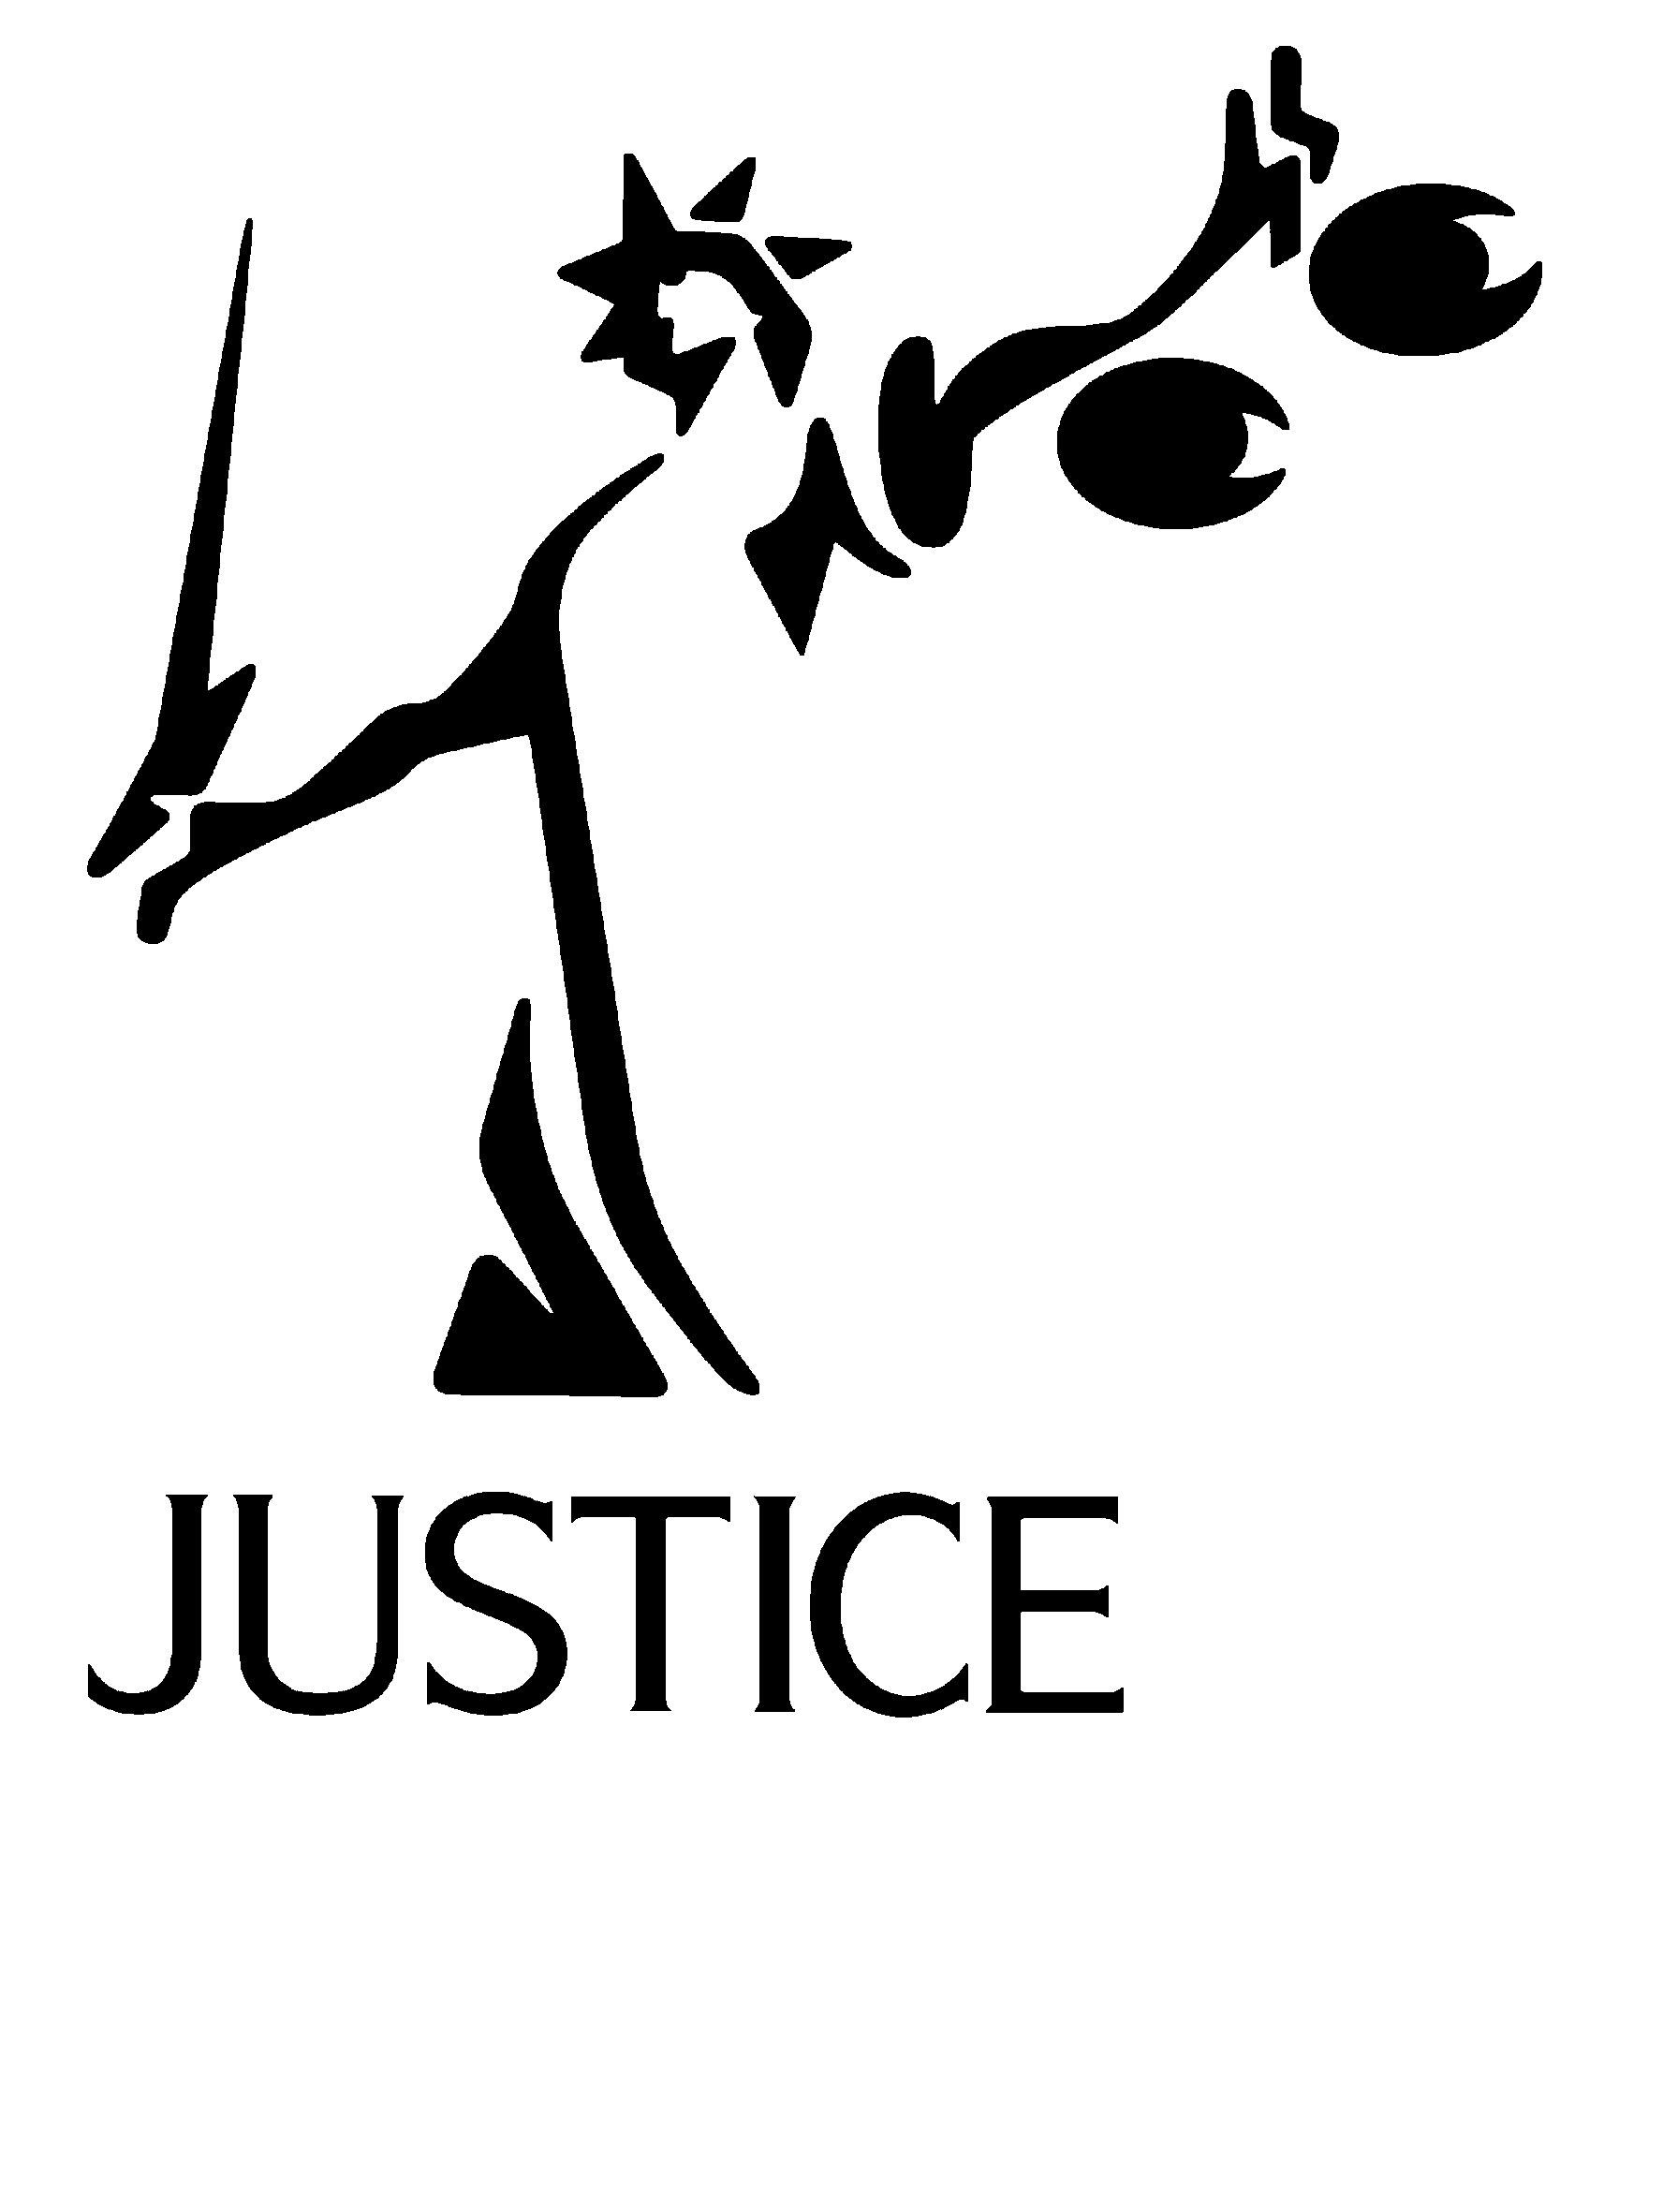 blind justice images clipart best